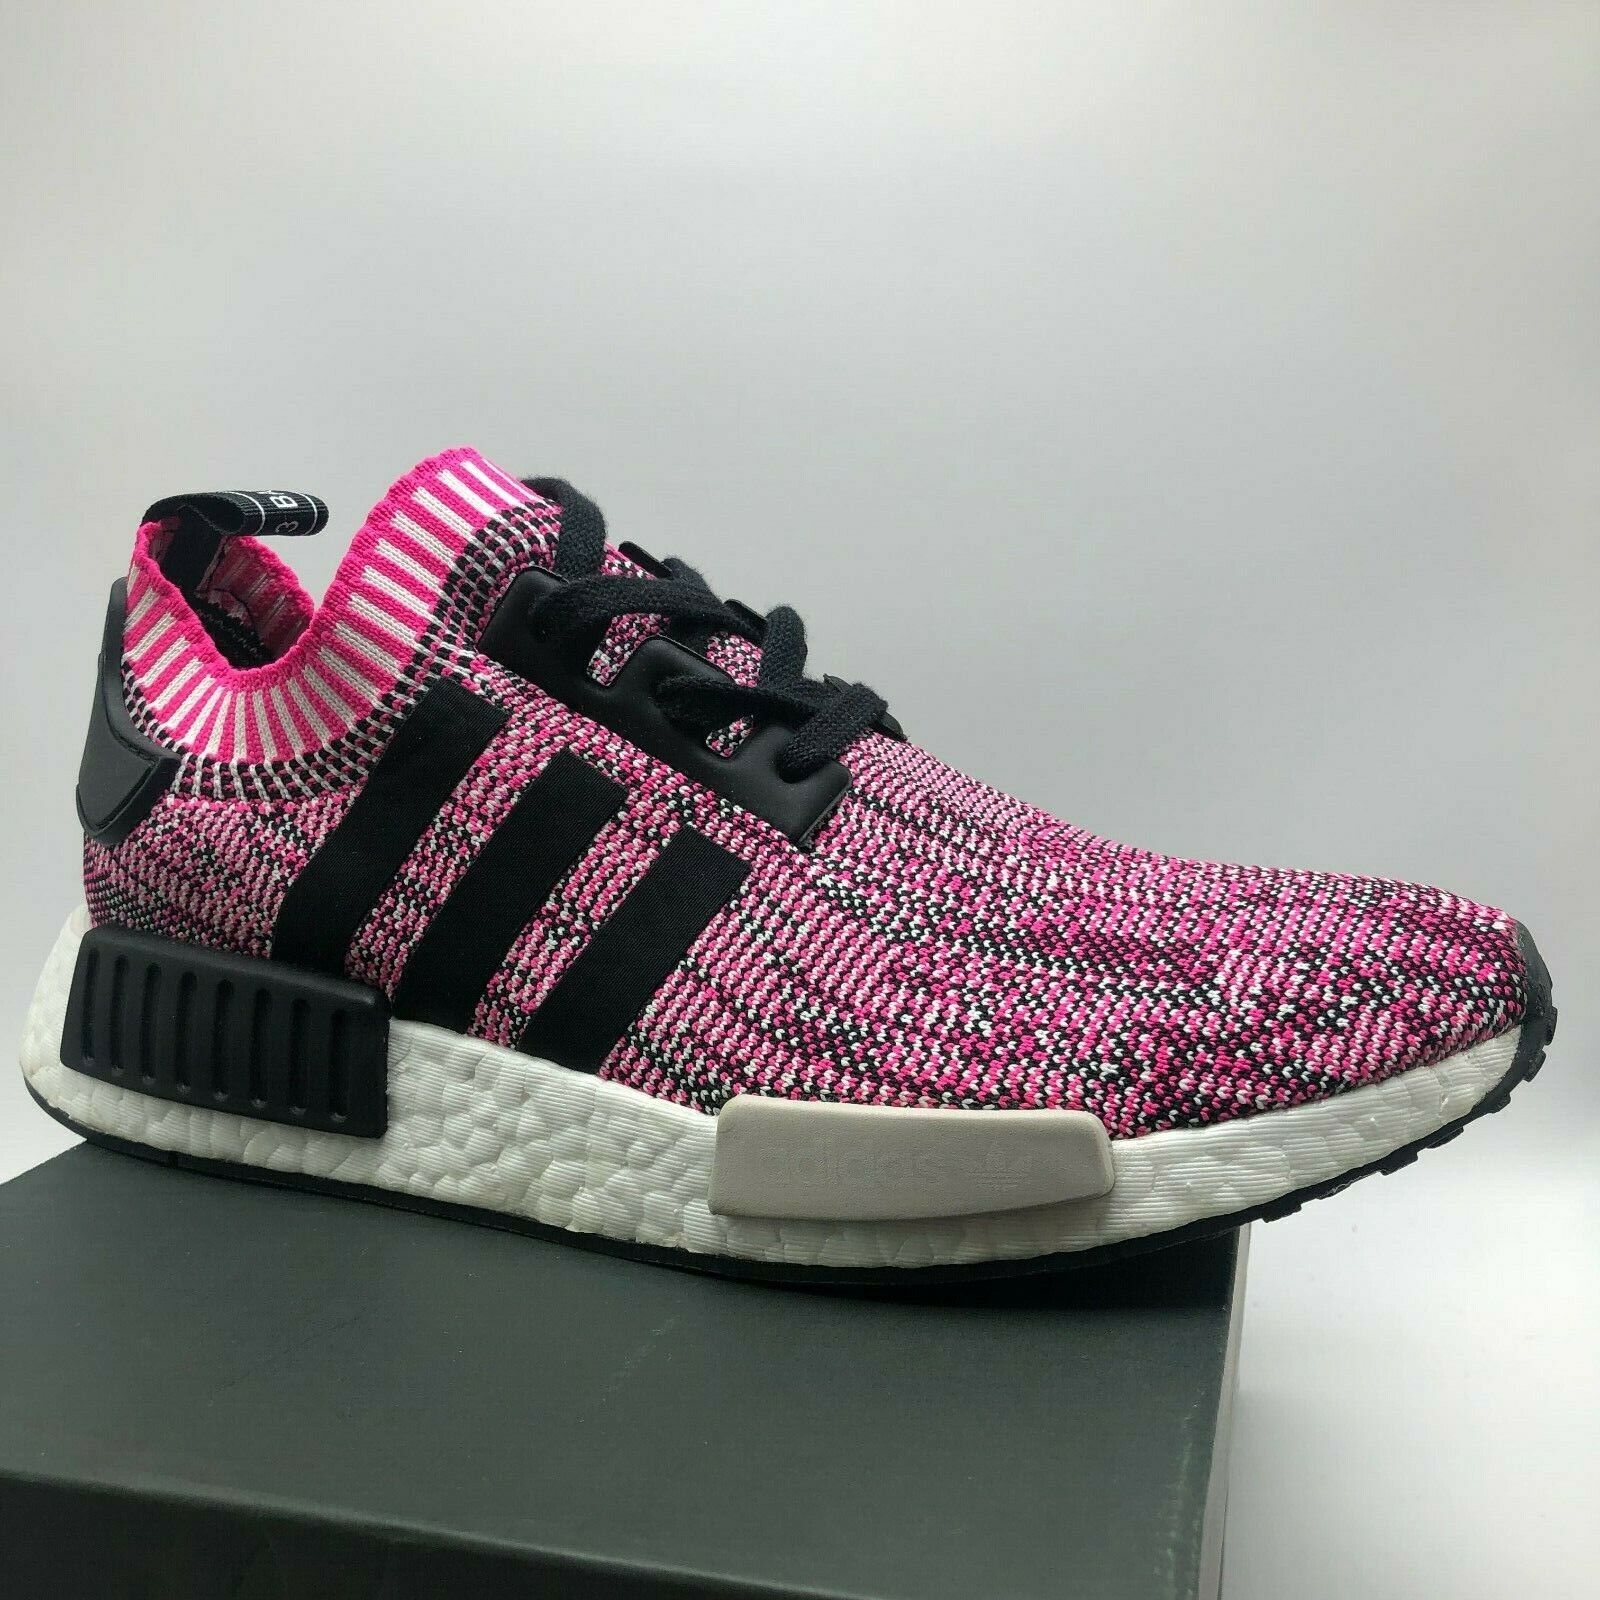 Adidas Nmd R1 Pk Womens Bb2363 Fuchsia Pink Primeknit Running